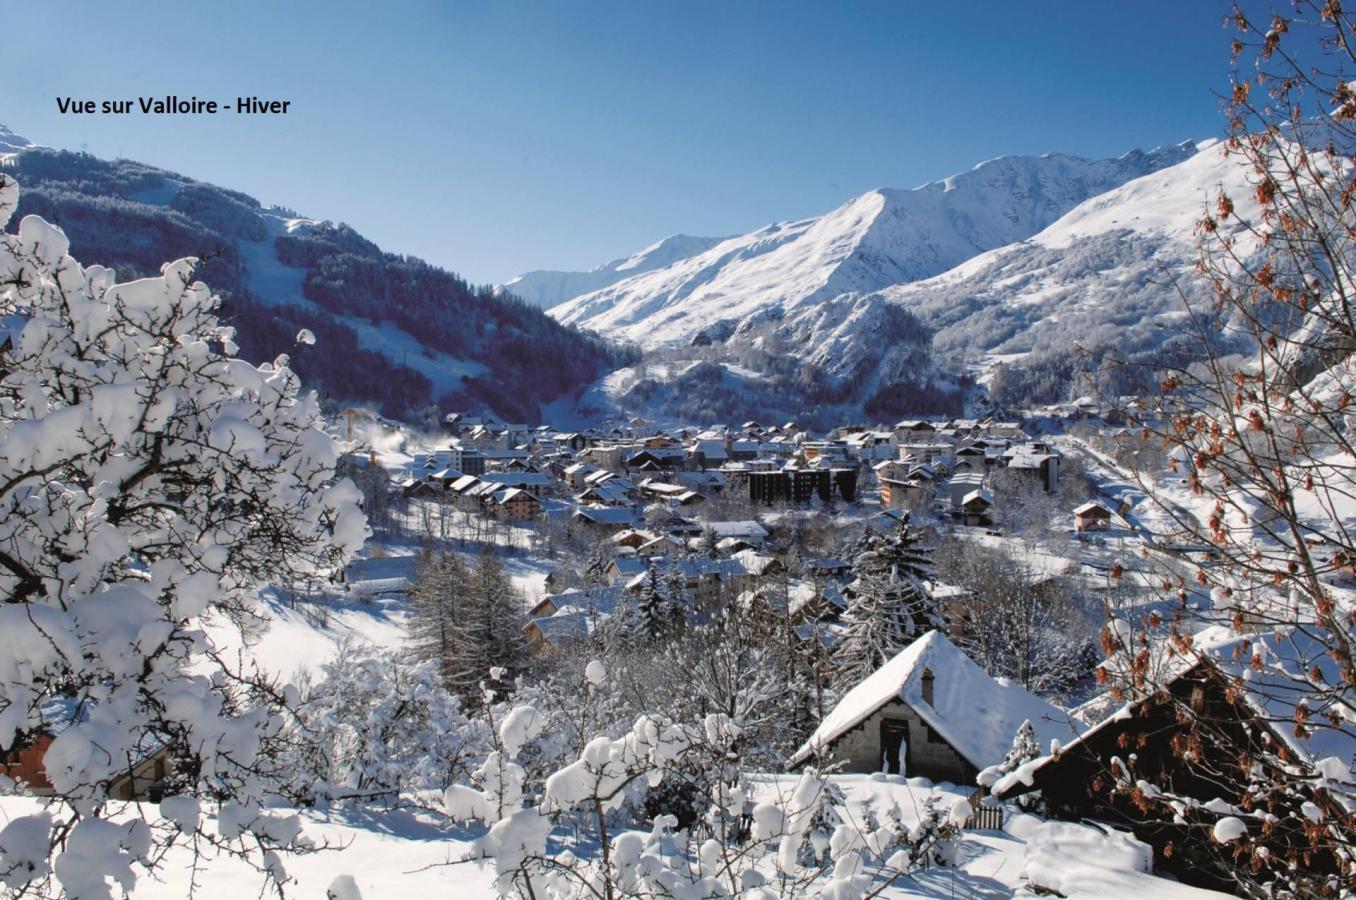 Location Residence Val D'aurea